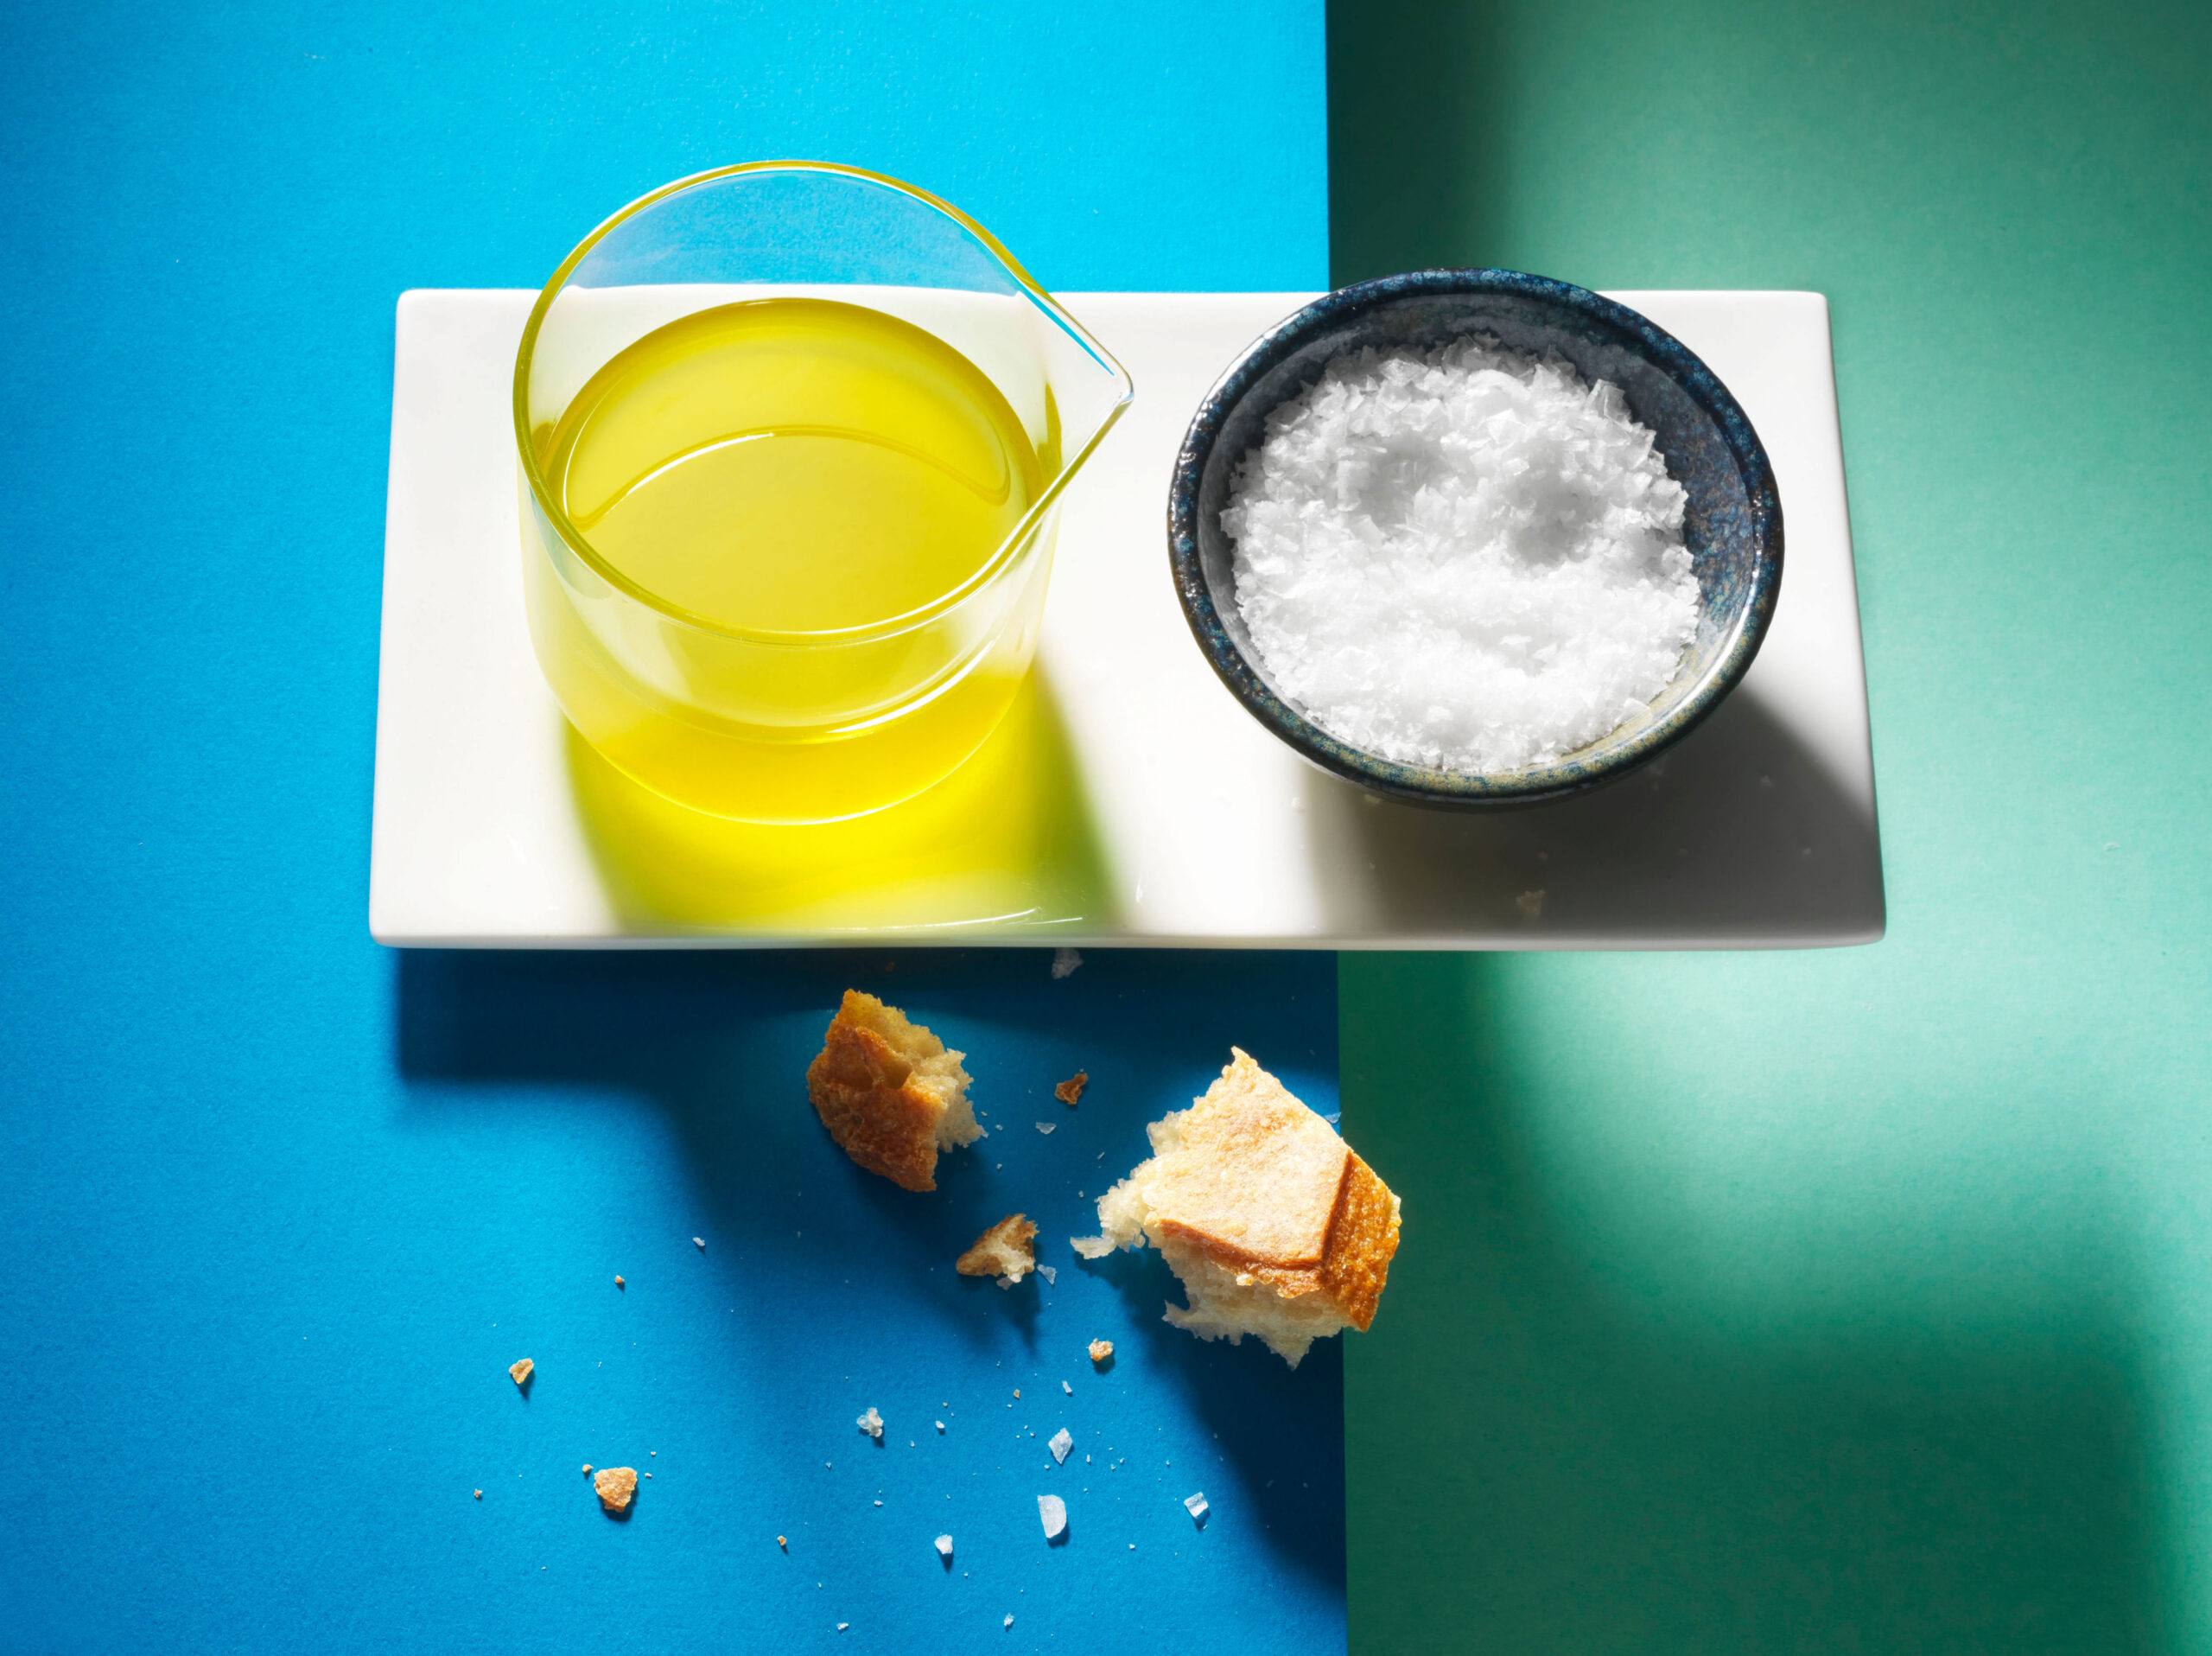 Creative food photo of SmartWhip recipe Basil Oil made by STUDIO_M Amsterdam